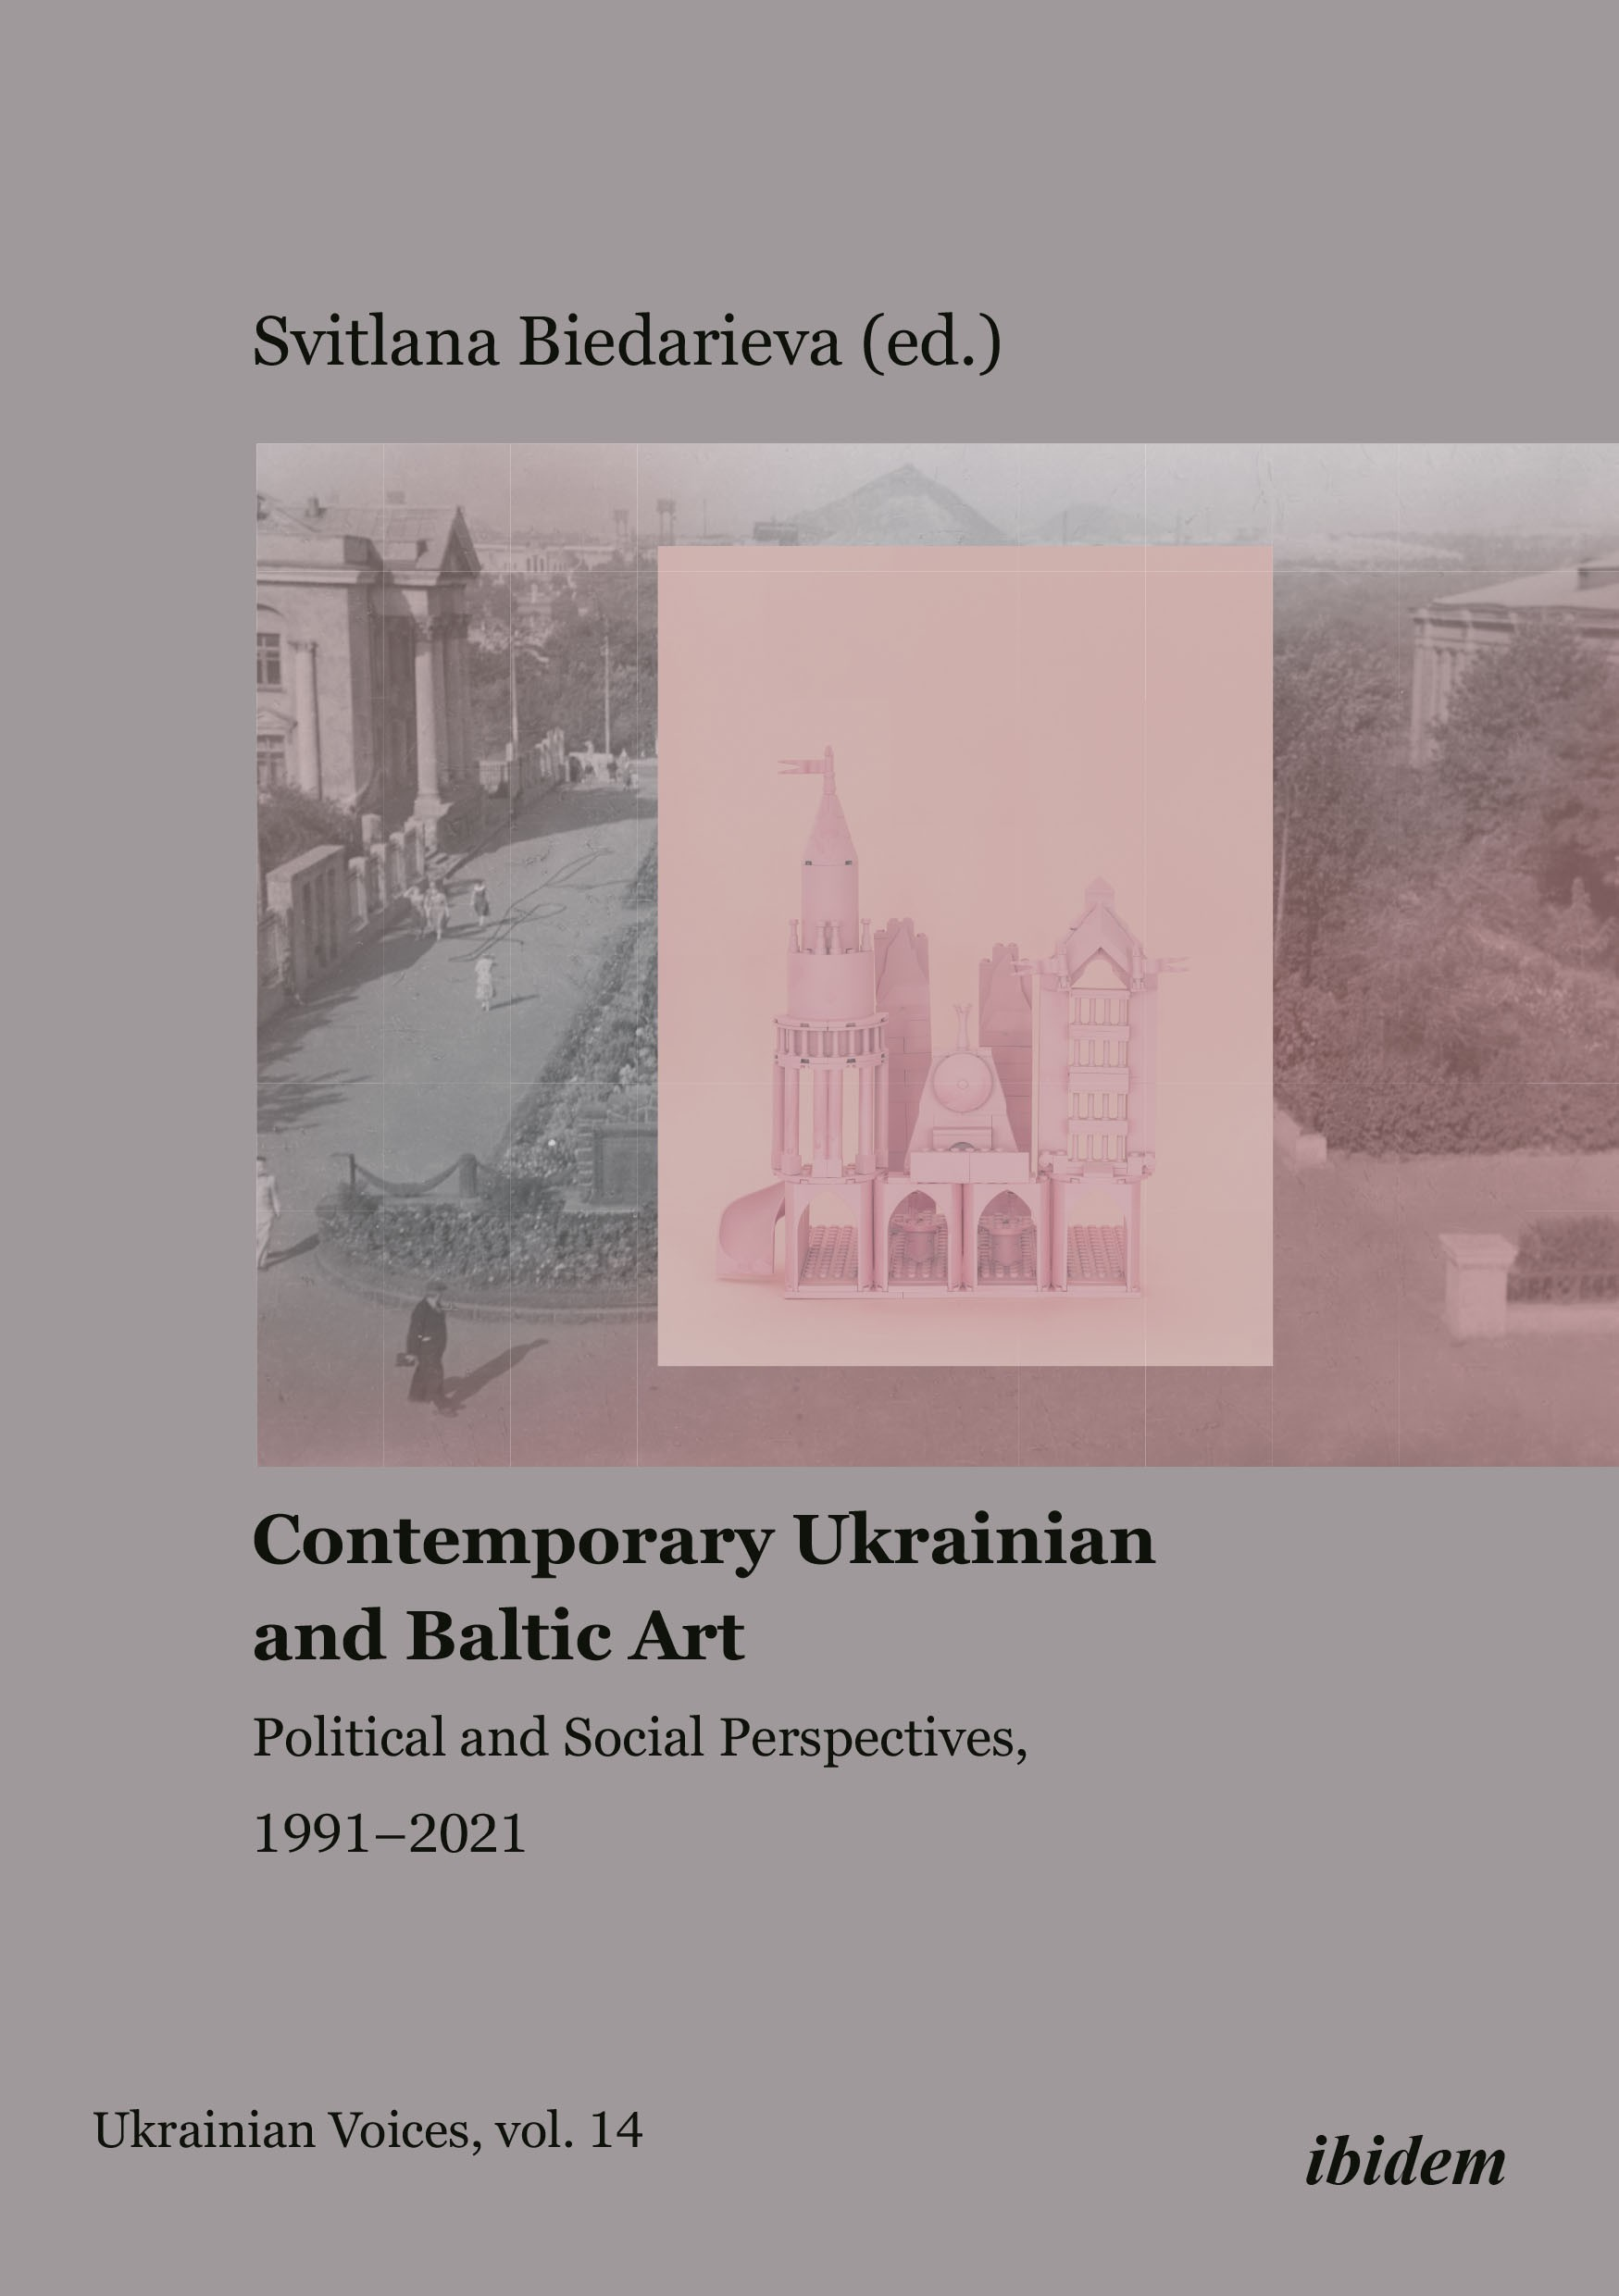 Contemporary Ukrainian and Baltic Art